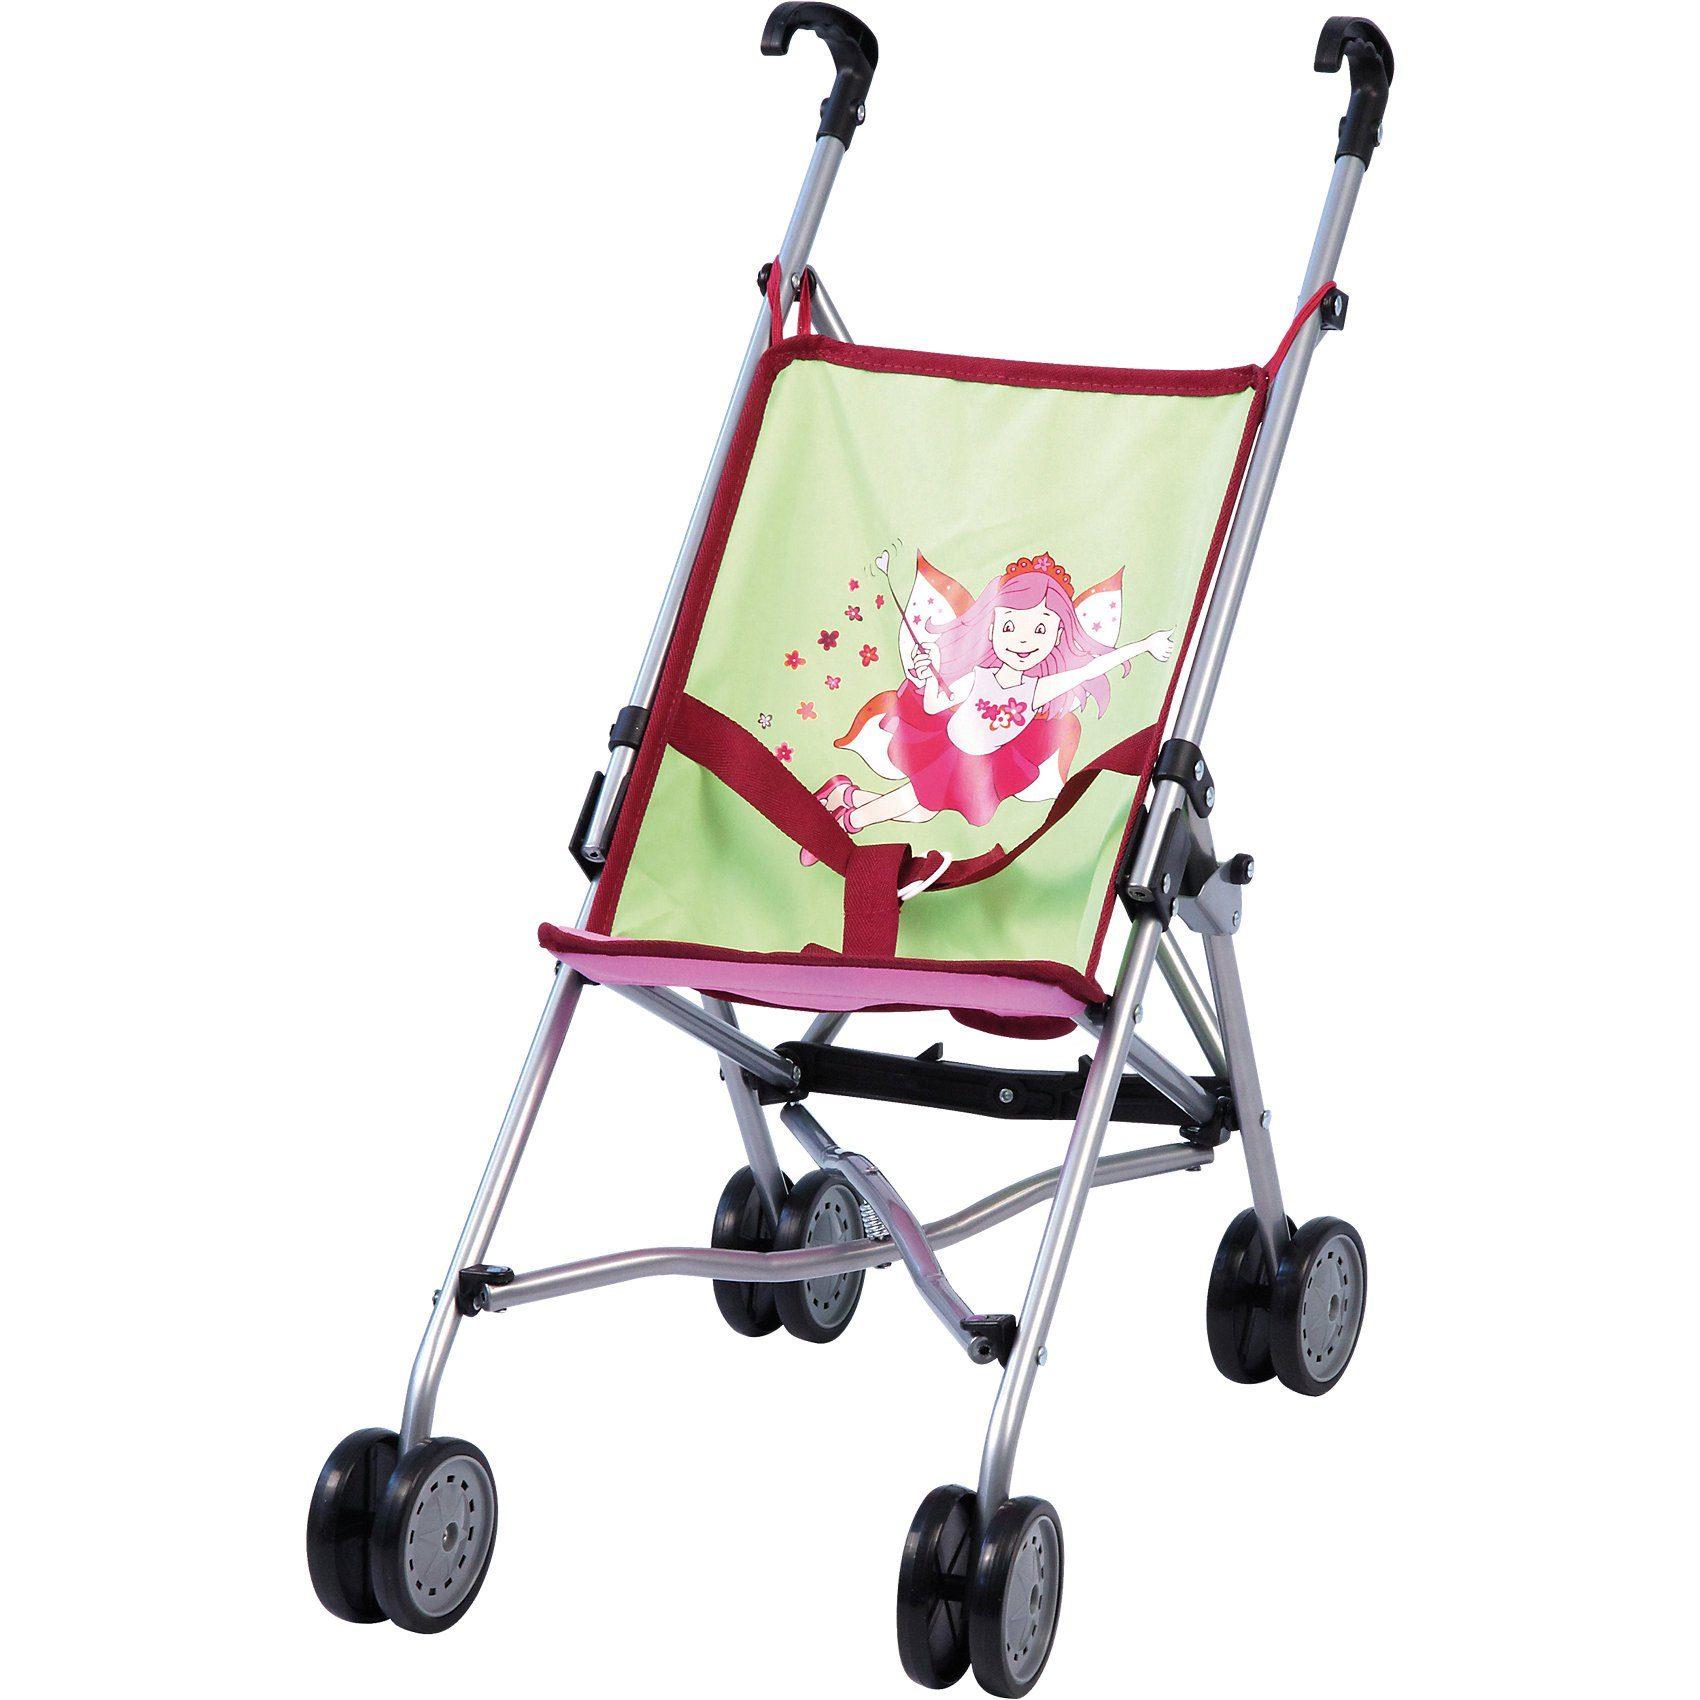 BAYER Puppenwagen Buggy pink/grün